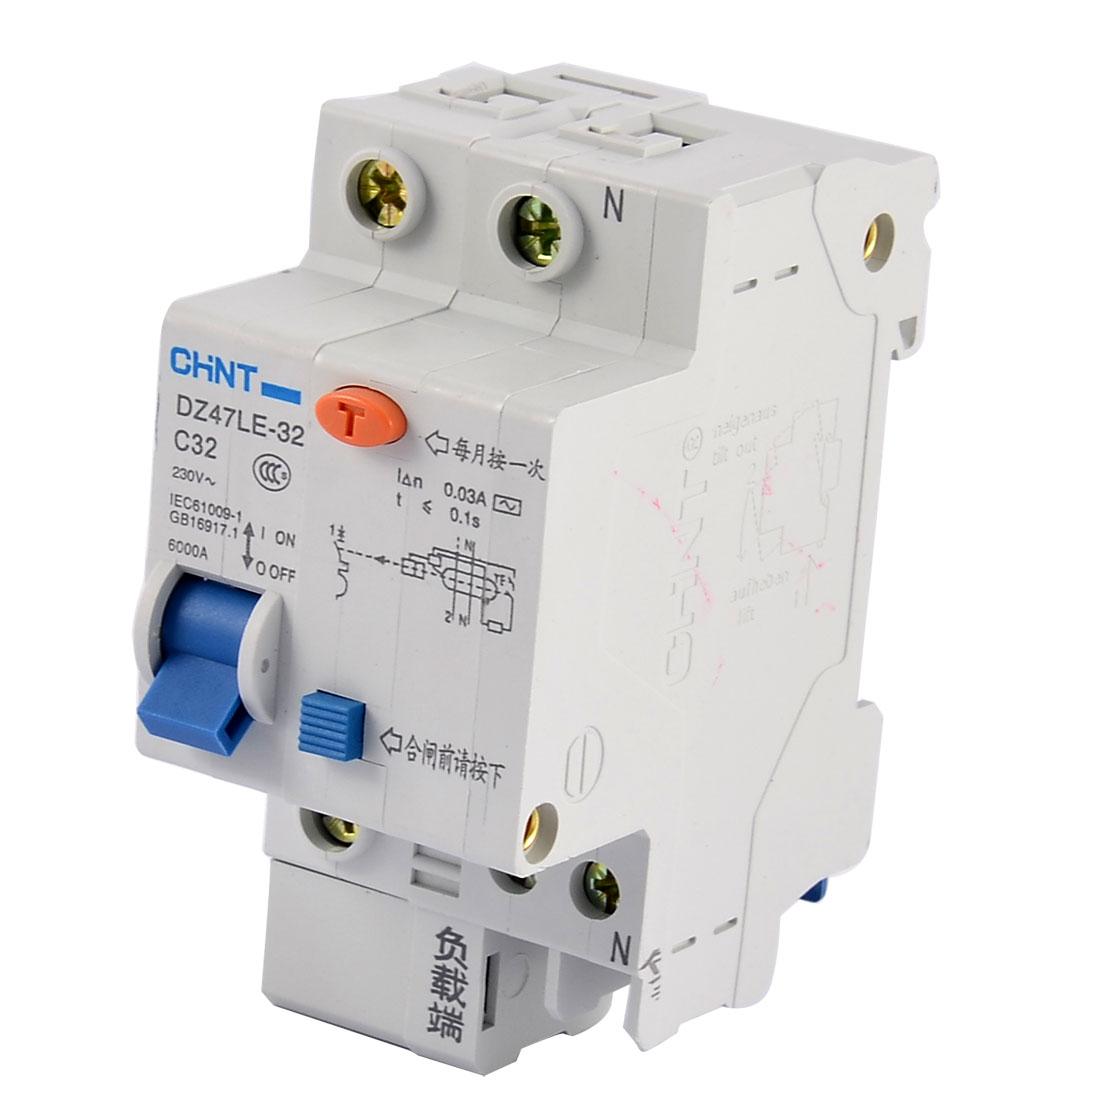 DZ47LE C32 AC 230V 1P+N Miniature ELCB Earth Leakage Circuit Breaker